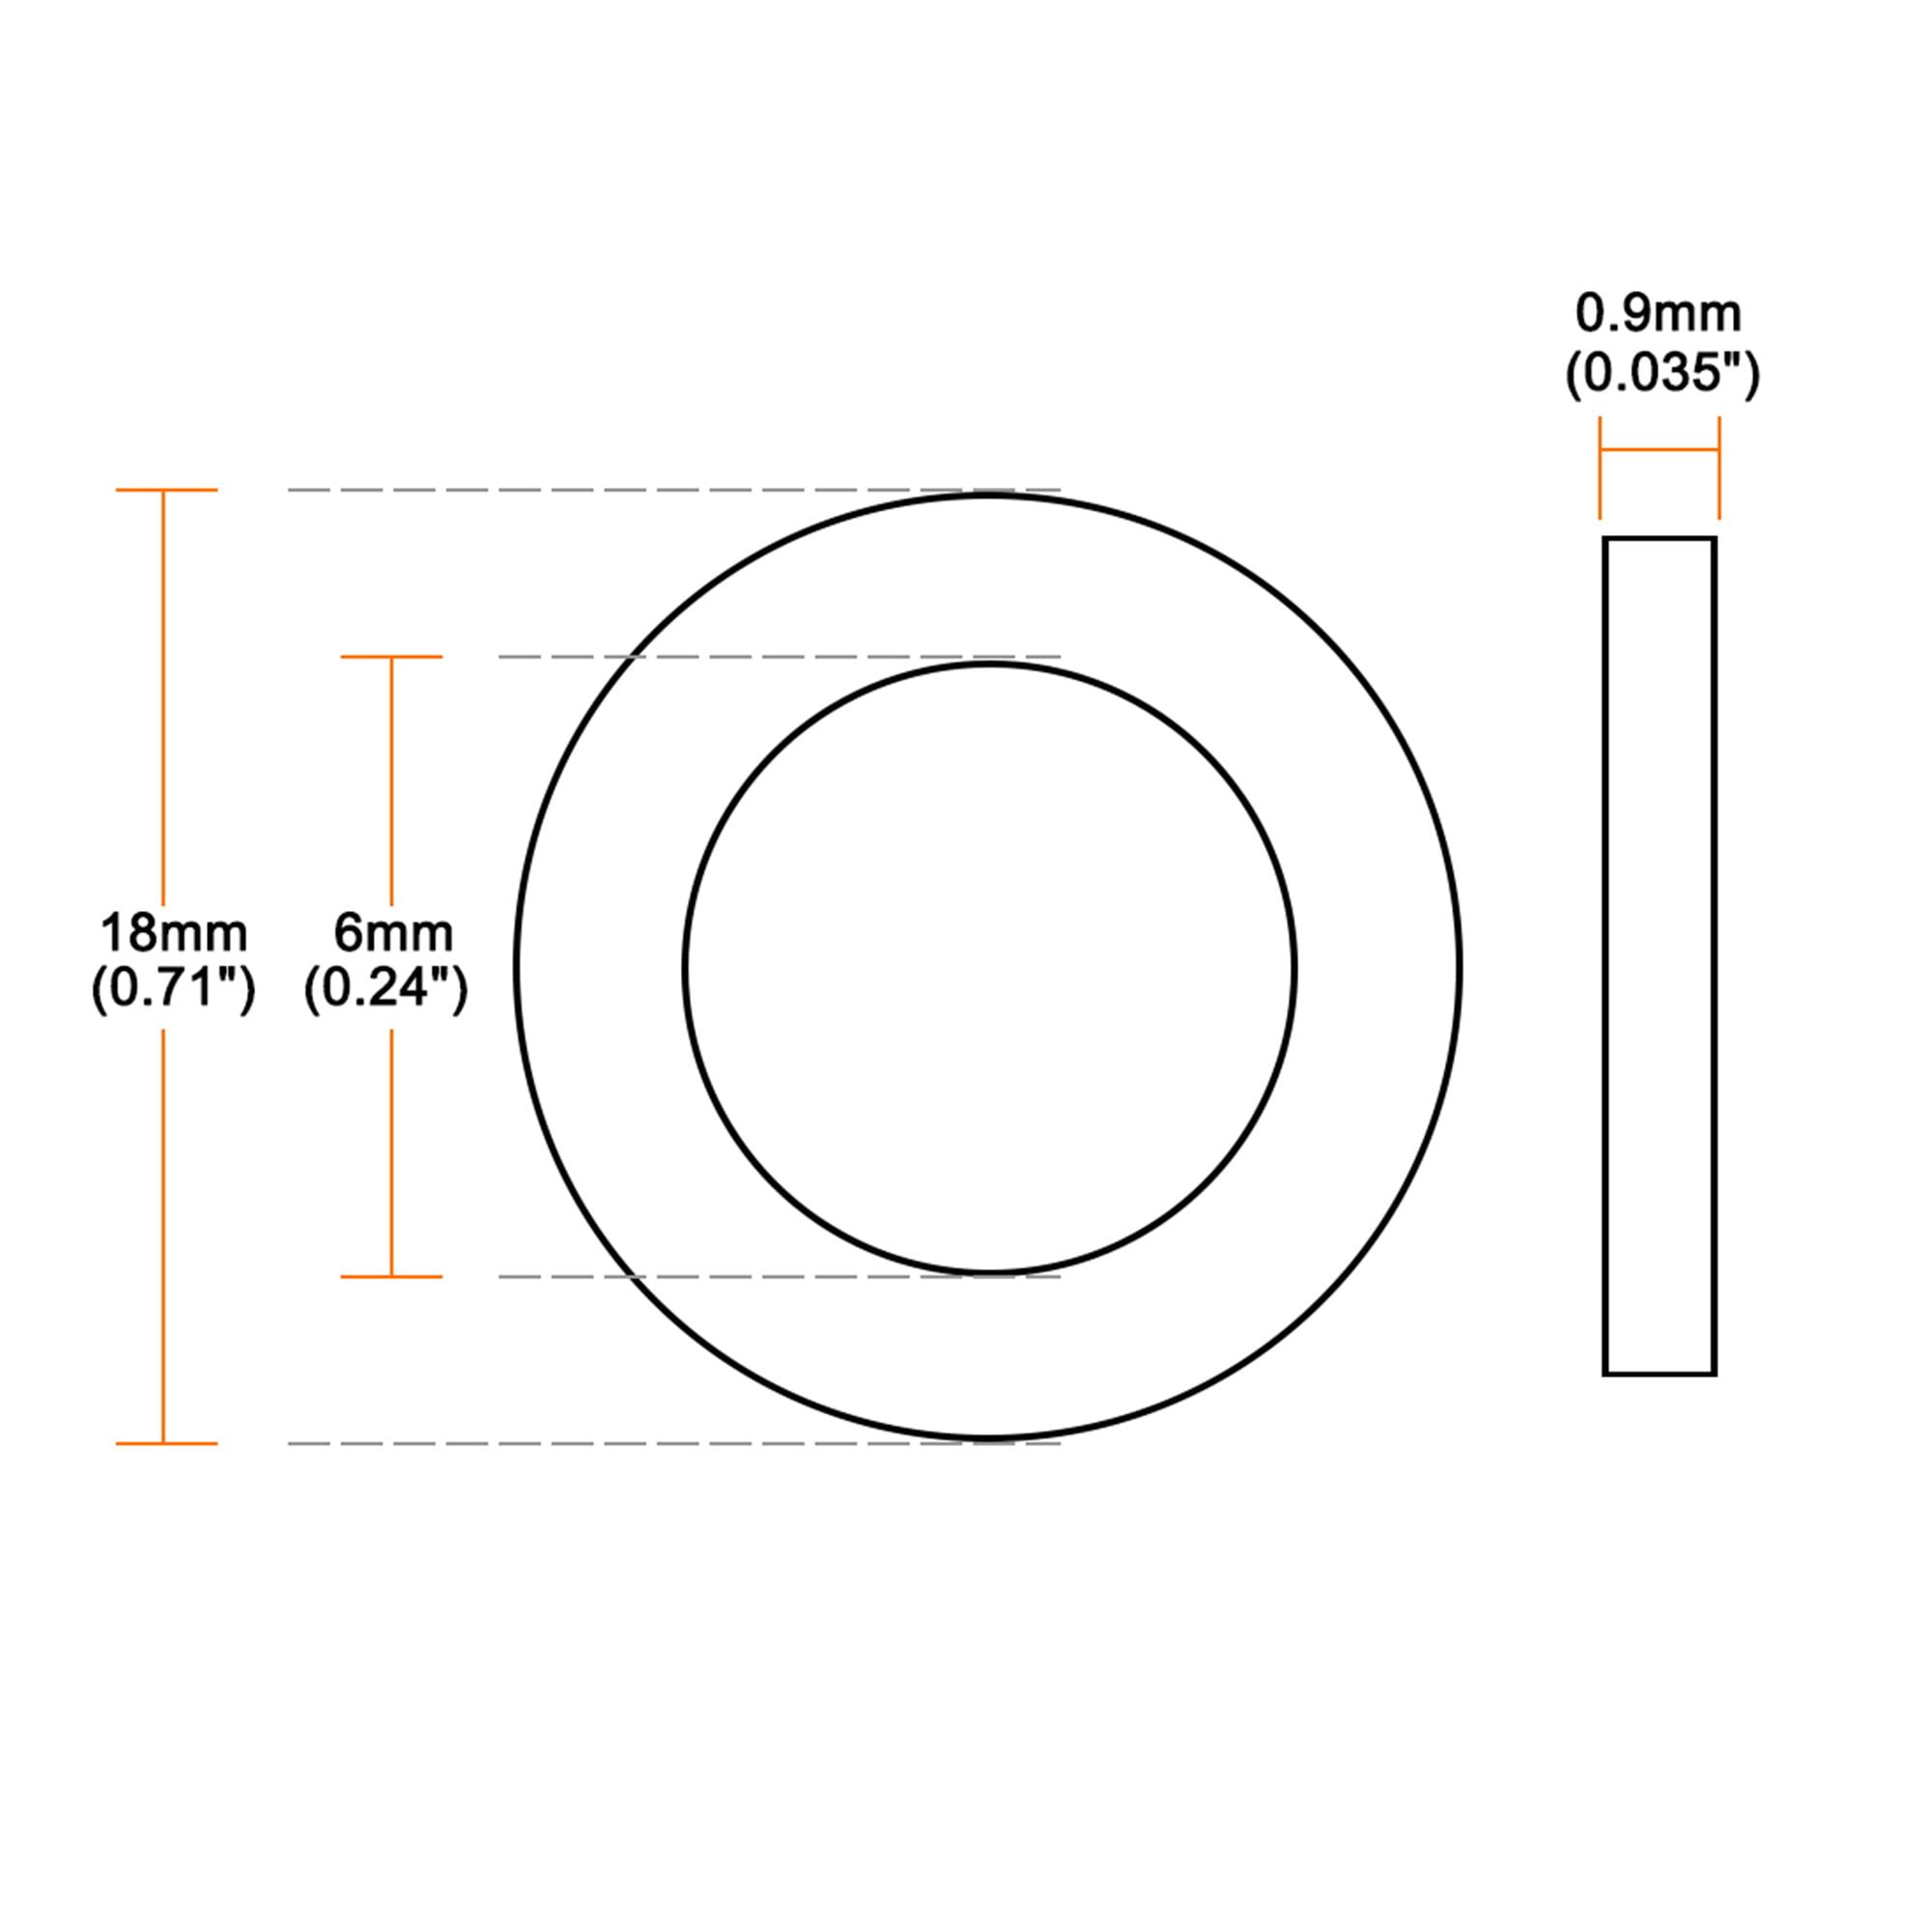 Nylon Flat washers for M6 Screw Bolt 18 mm OD 0.9 mm Transparent Thickness 50PCS